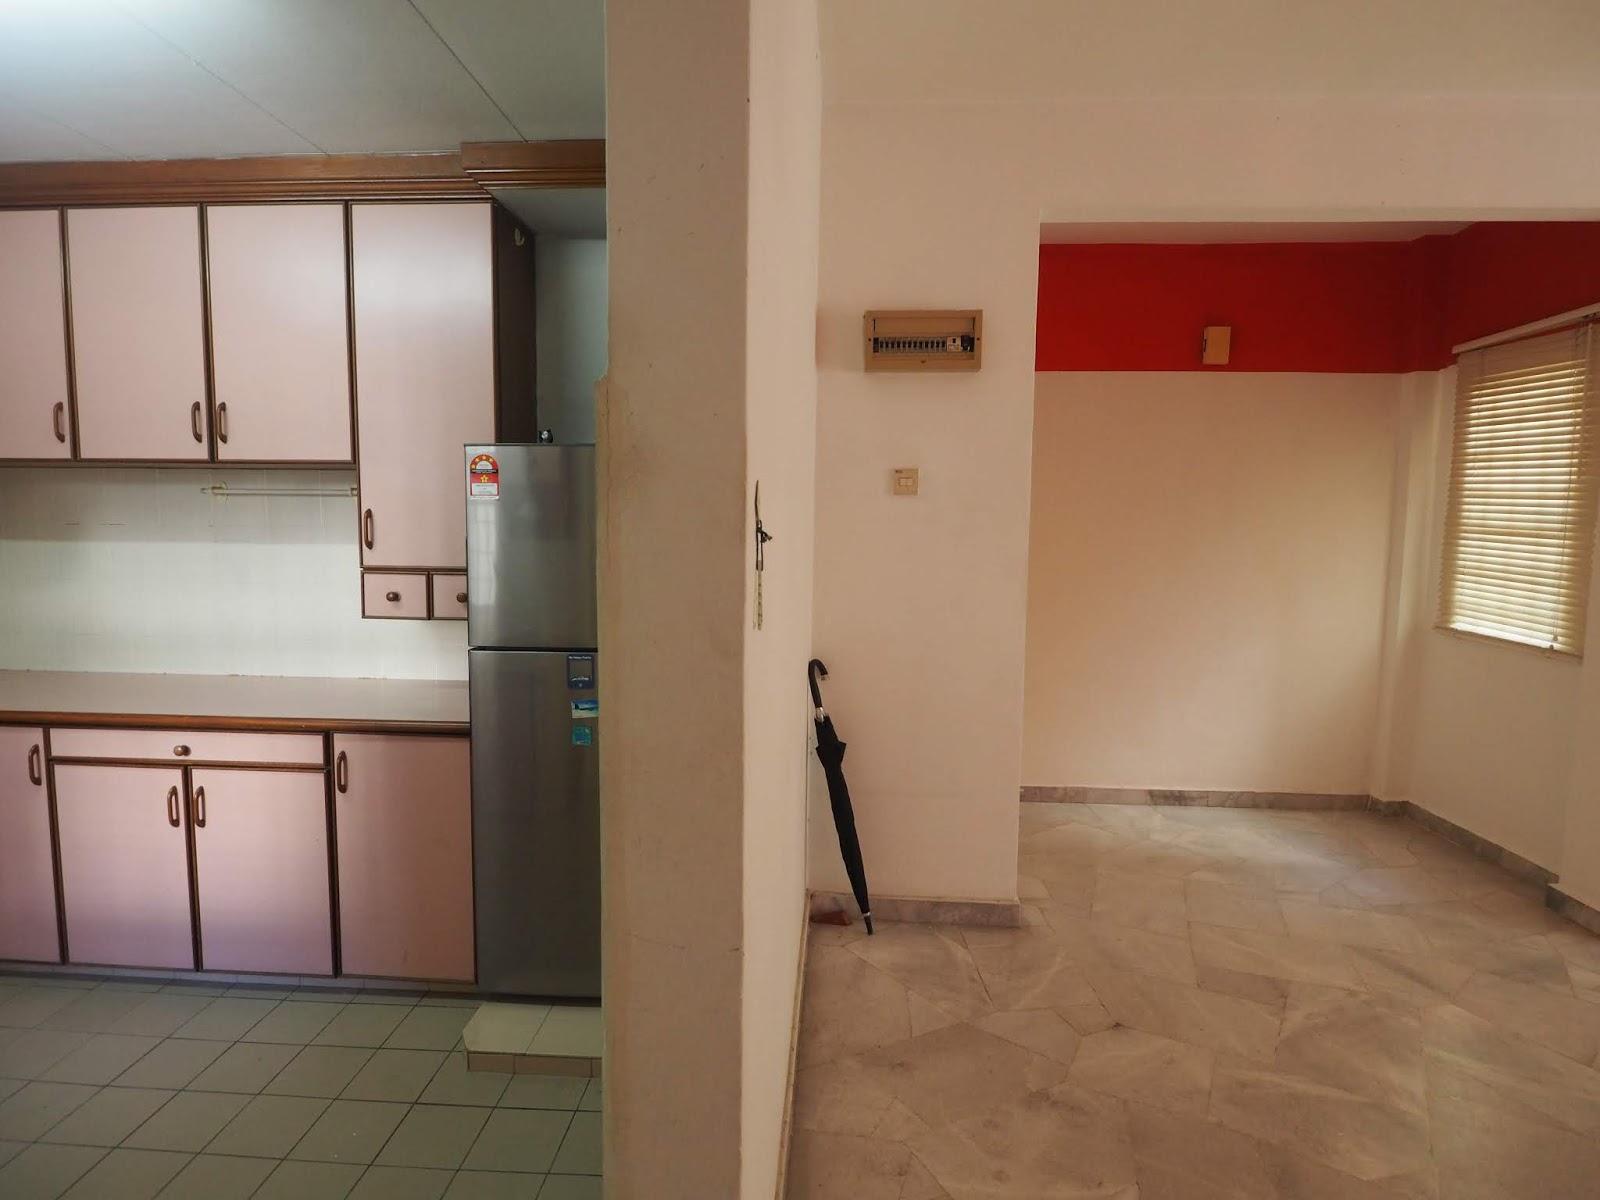 Arcadia Apartment Usj 11 Subang Jaya